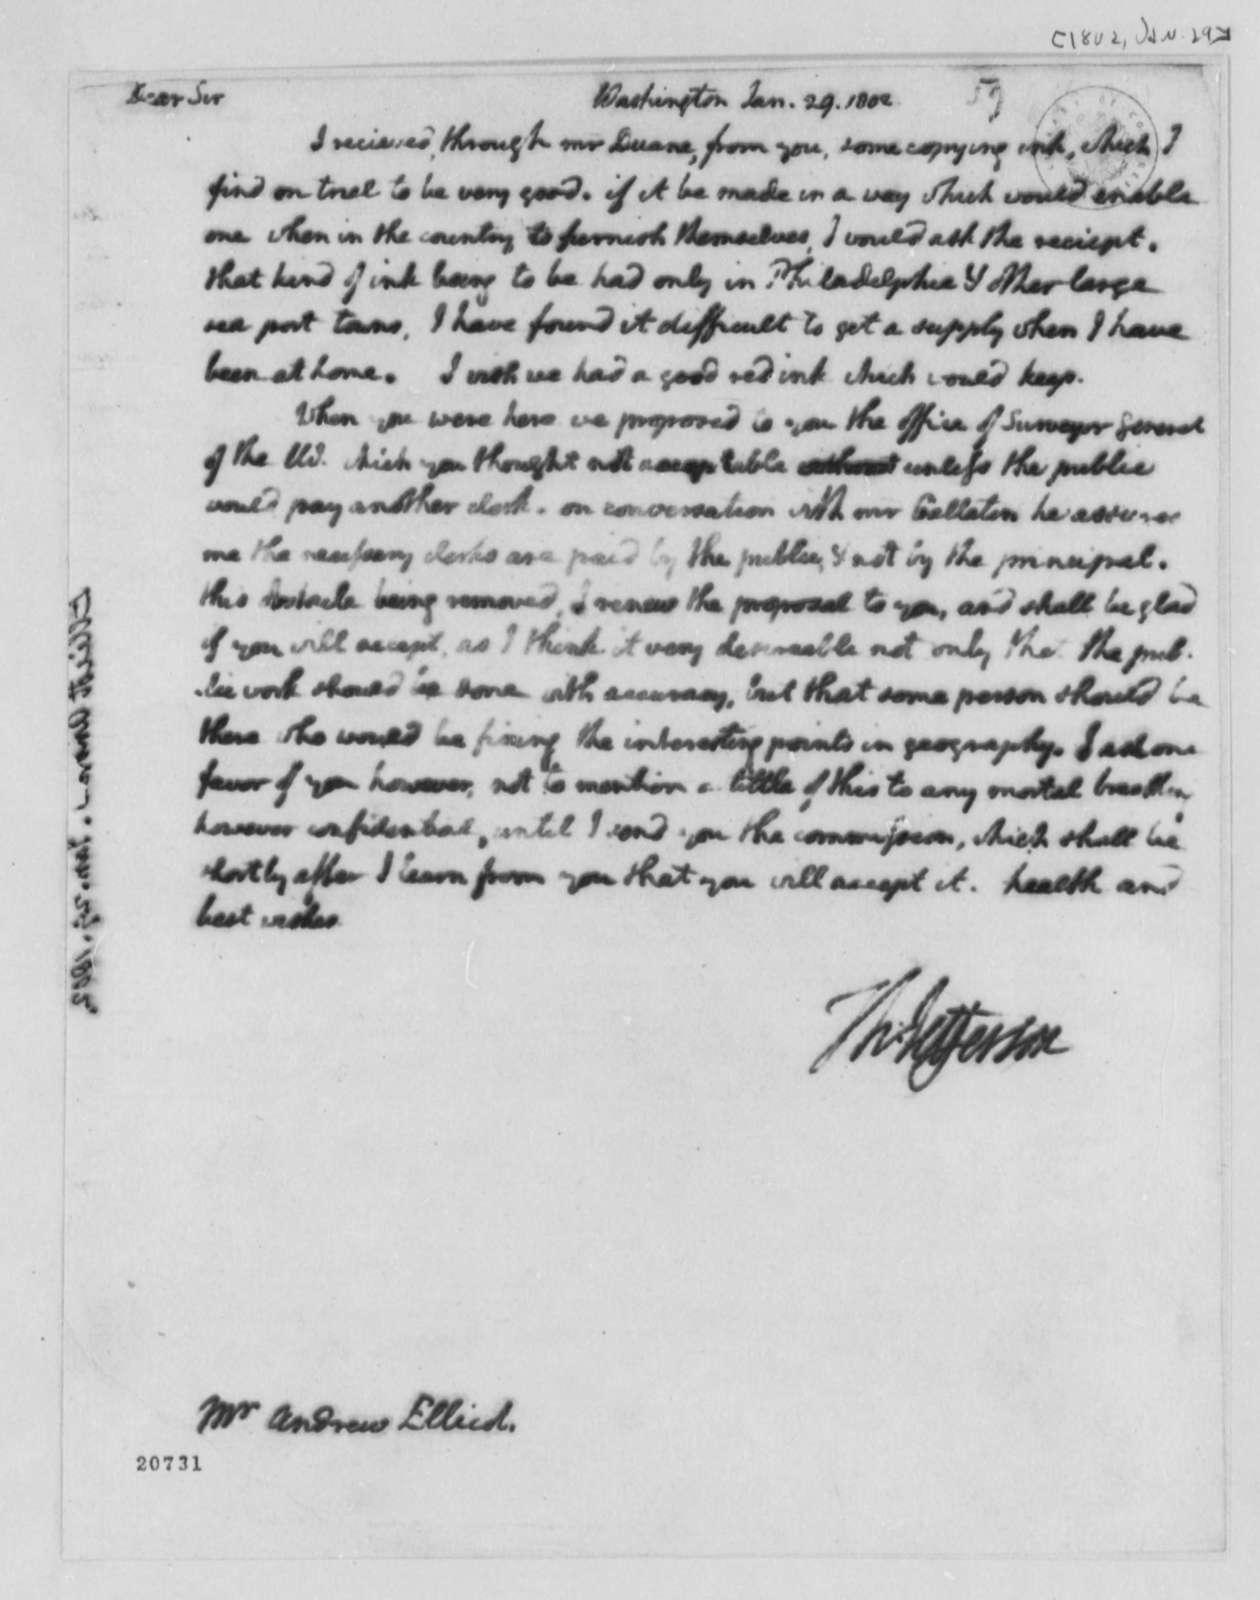 Thomas Jefferson to Andrew Ellicott, January 29, 1802